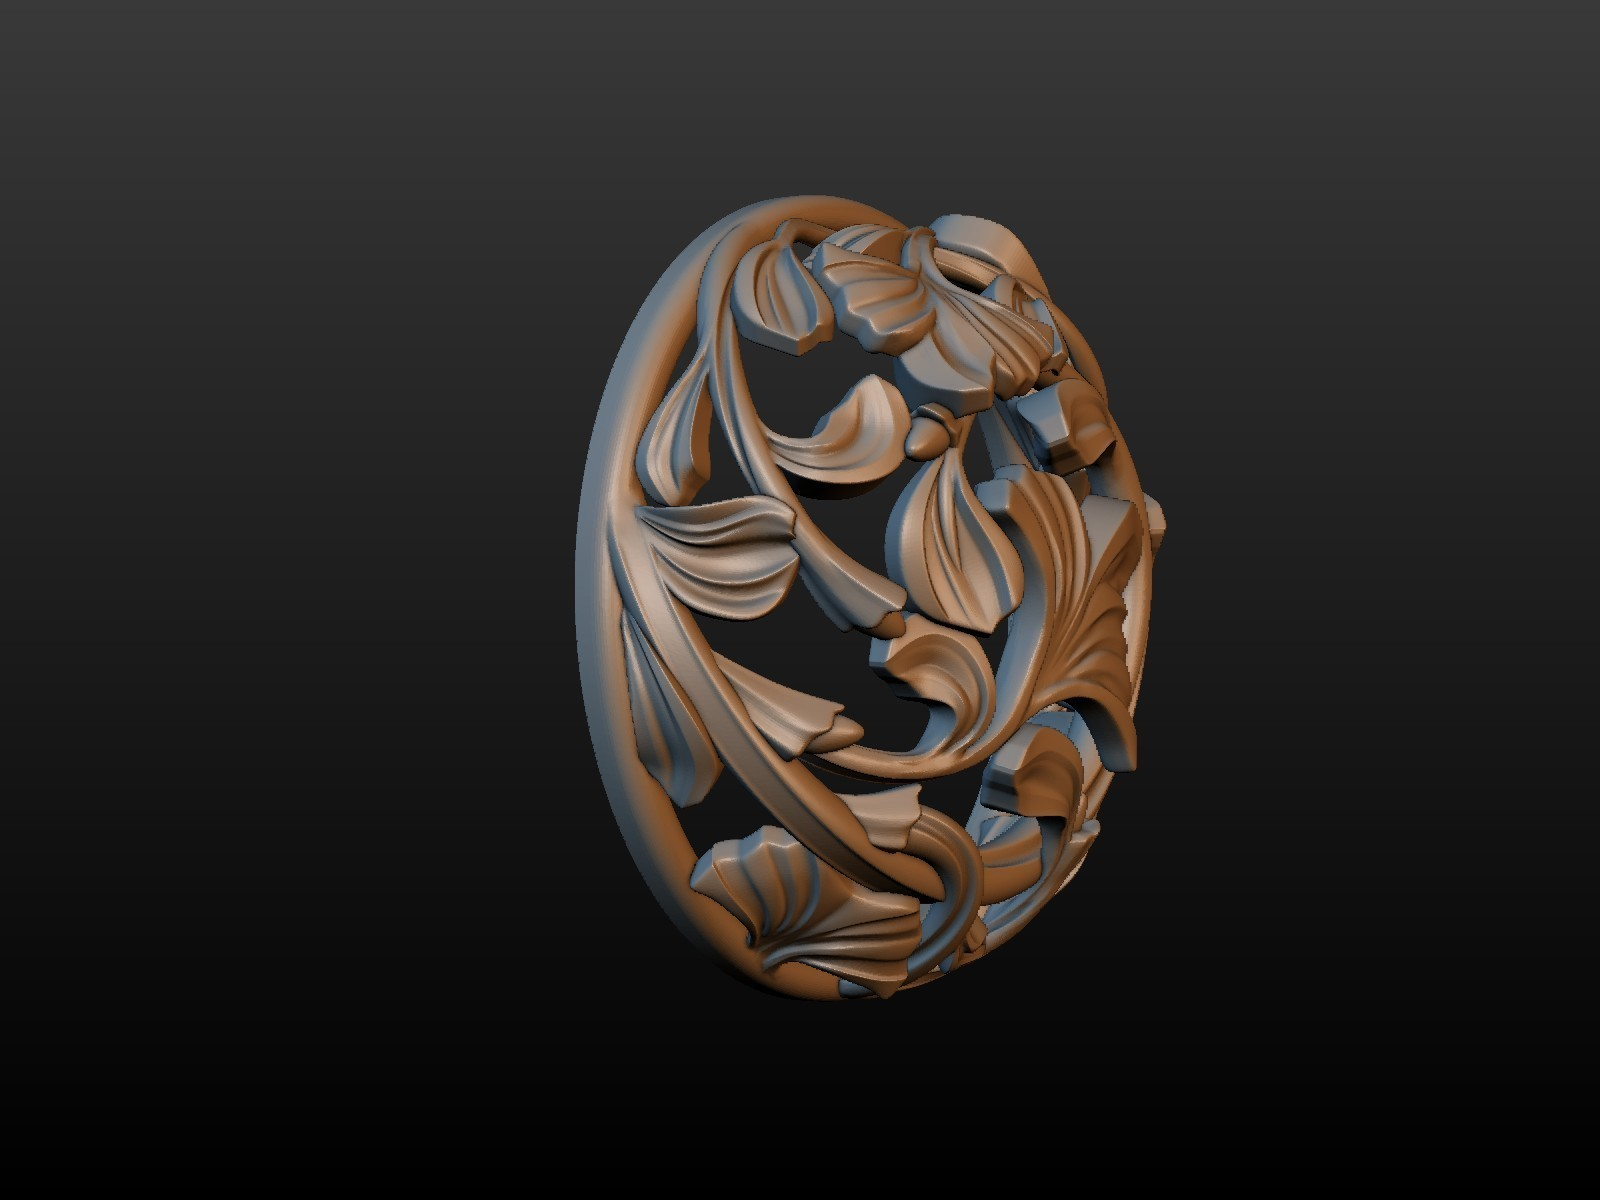 Earring-04.jpg Download STL file Earring • 3D printing template, Skazok